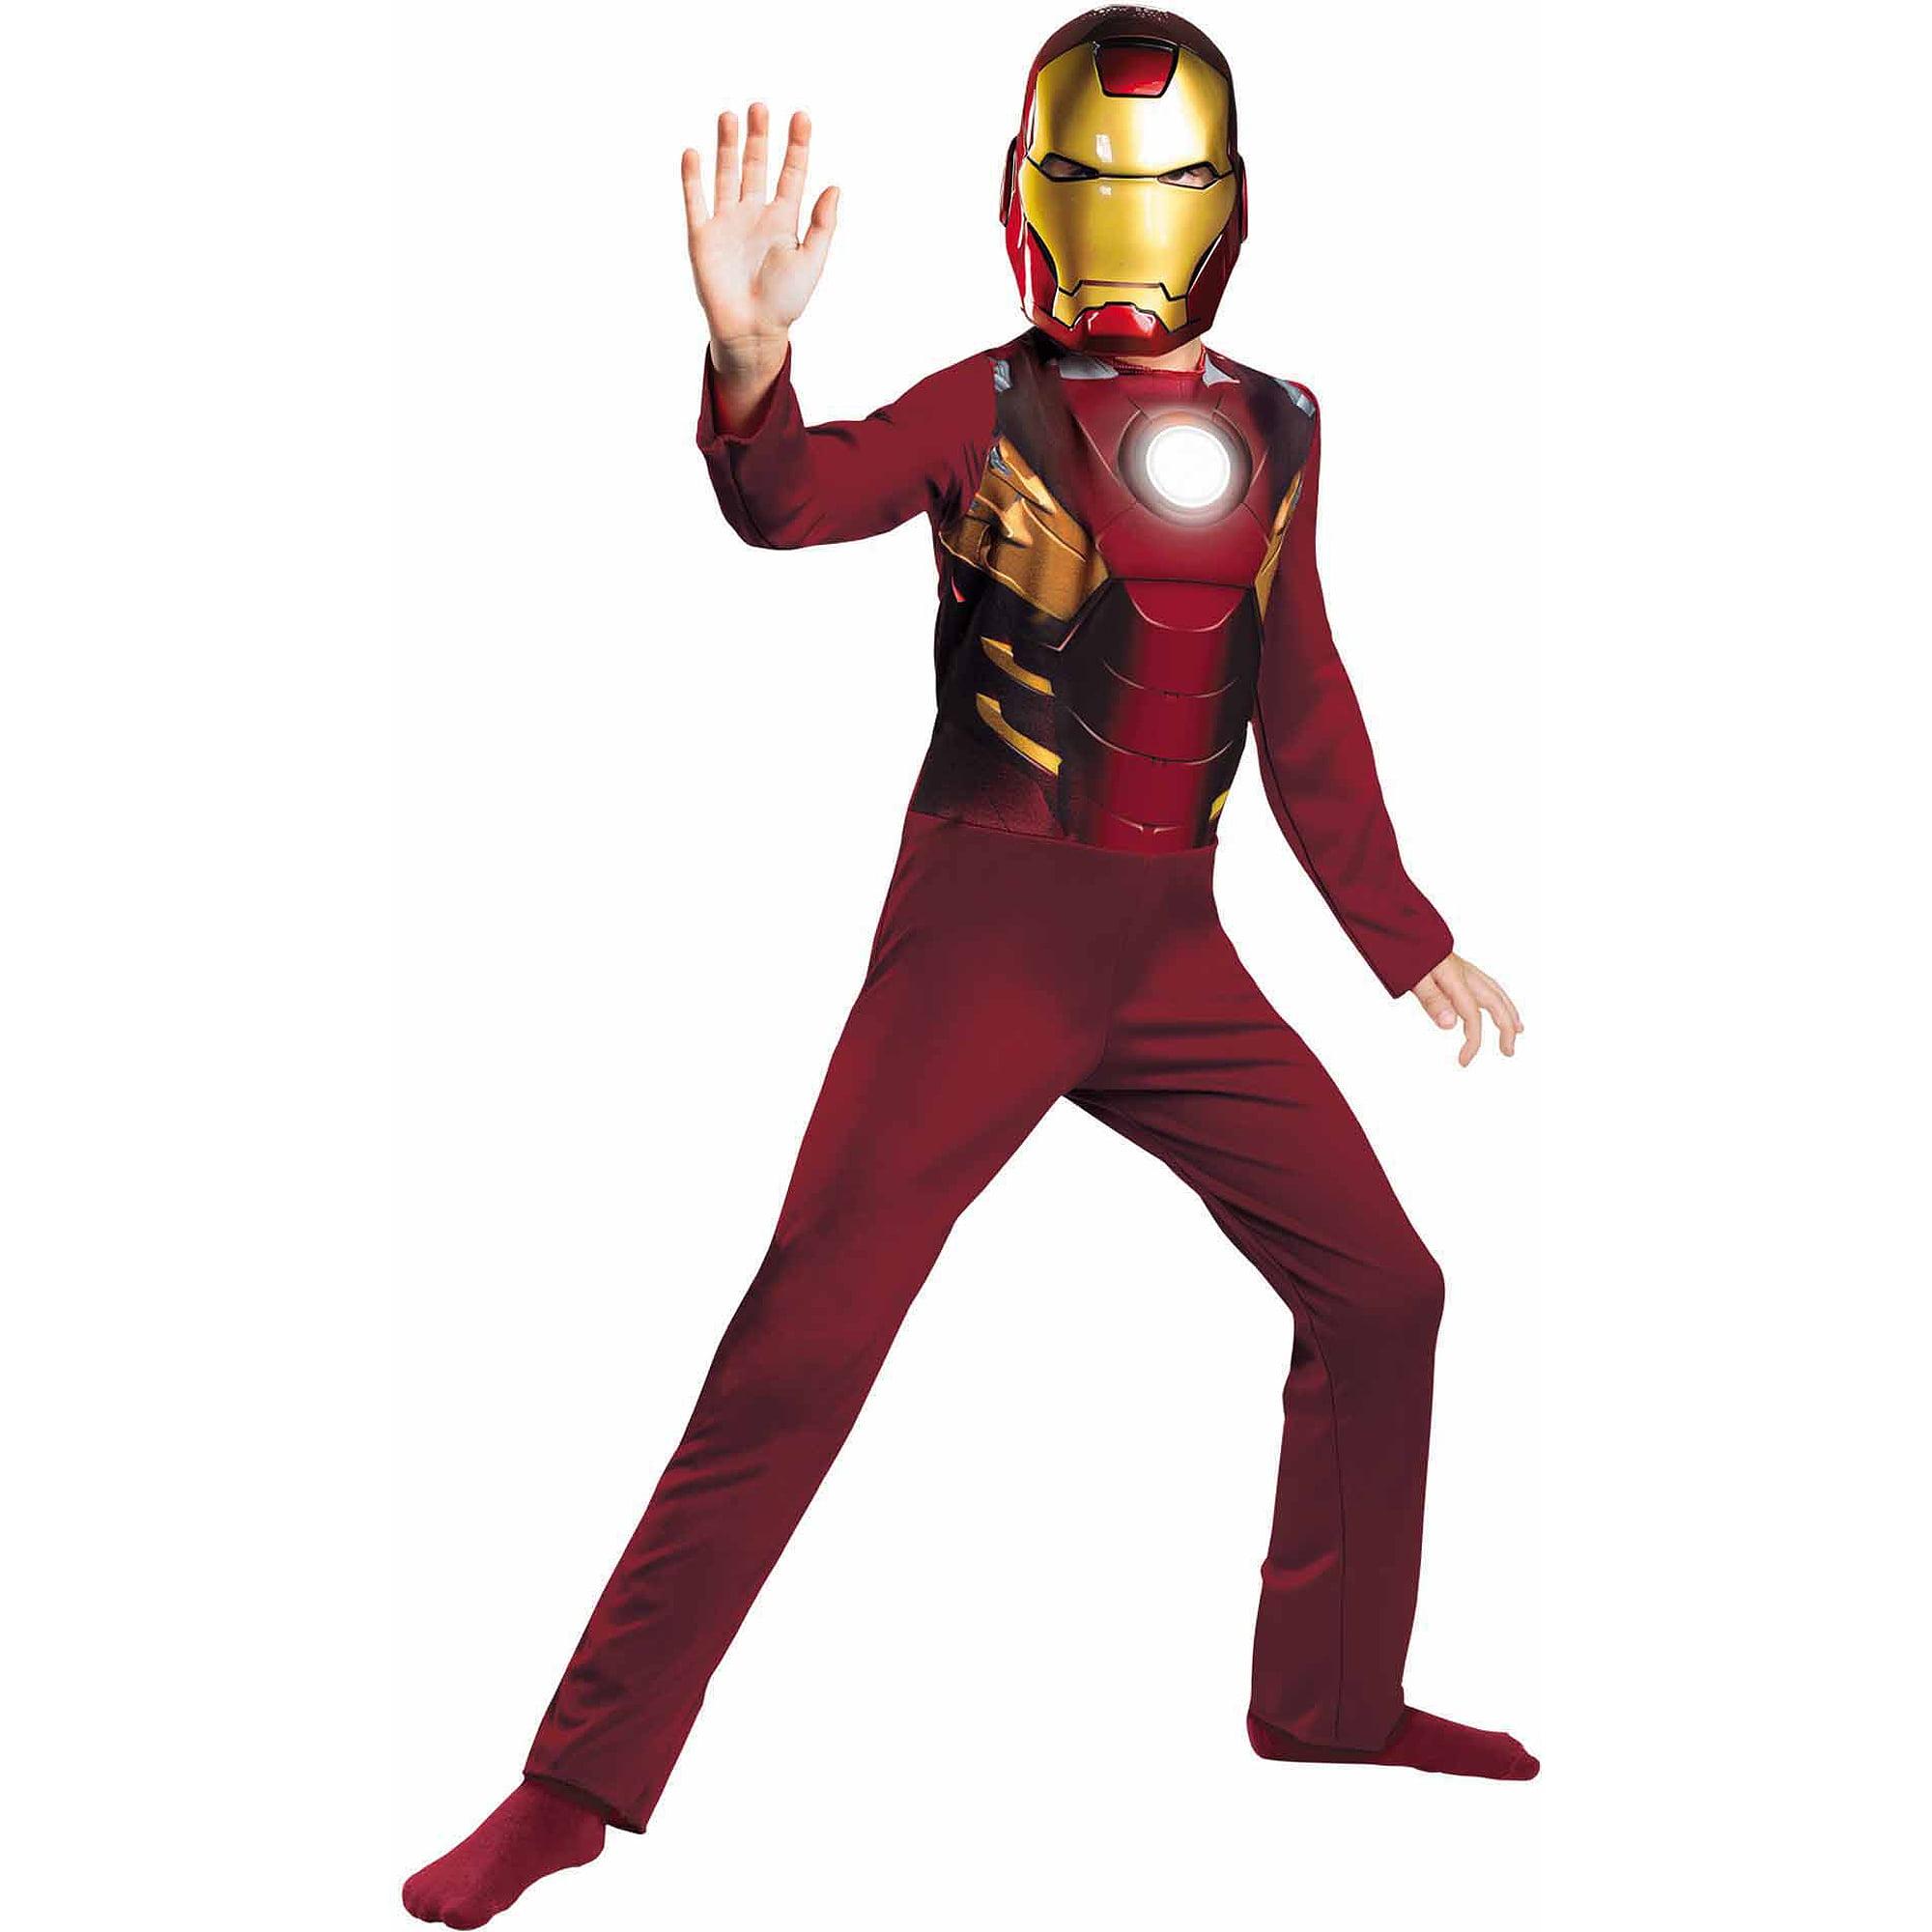 sc 1 st  Walmart & Iron Man Mark 7 Avengers Child Halloween Costume - Walmart.com